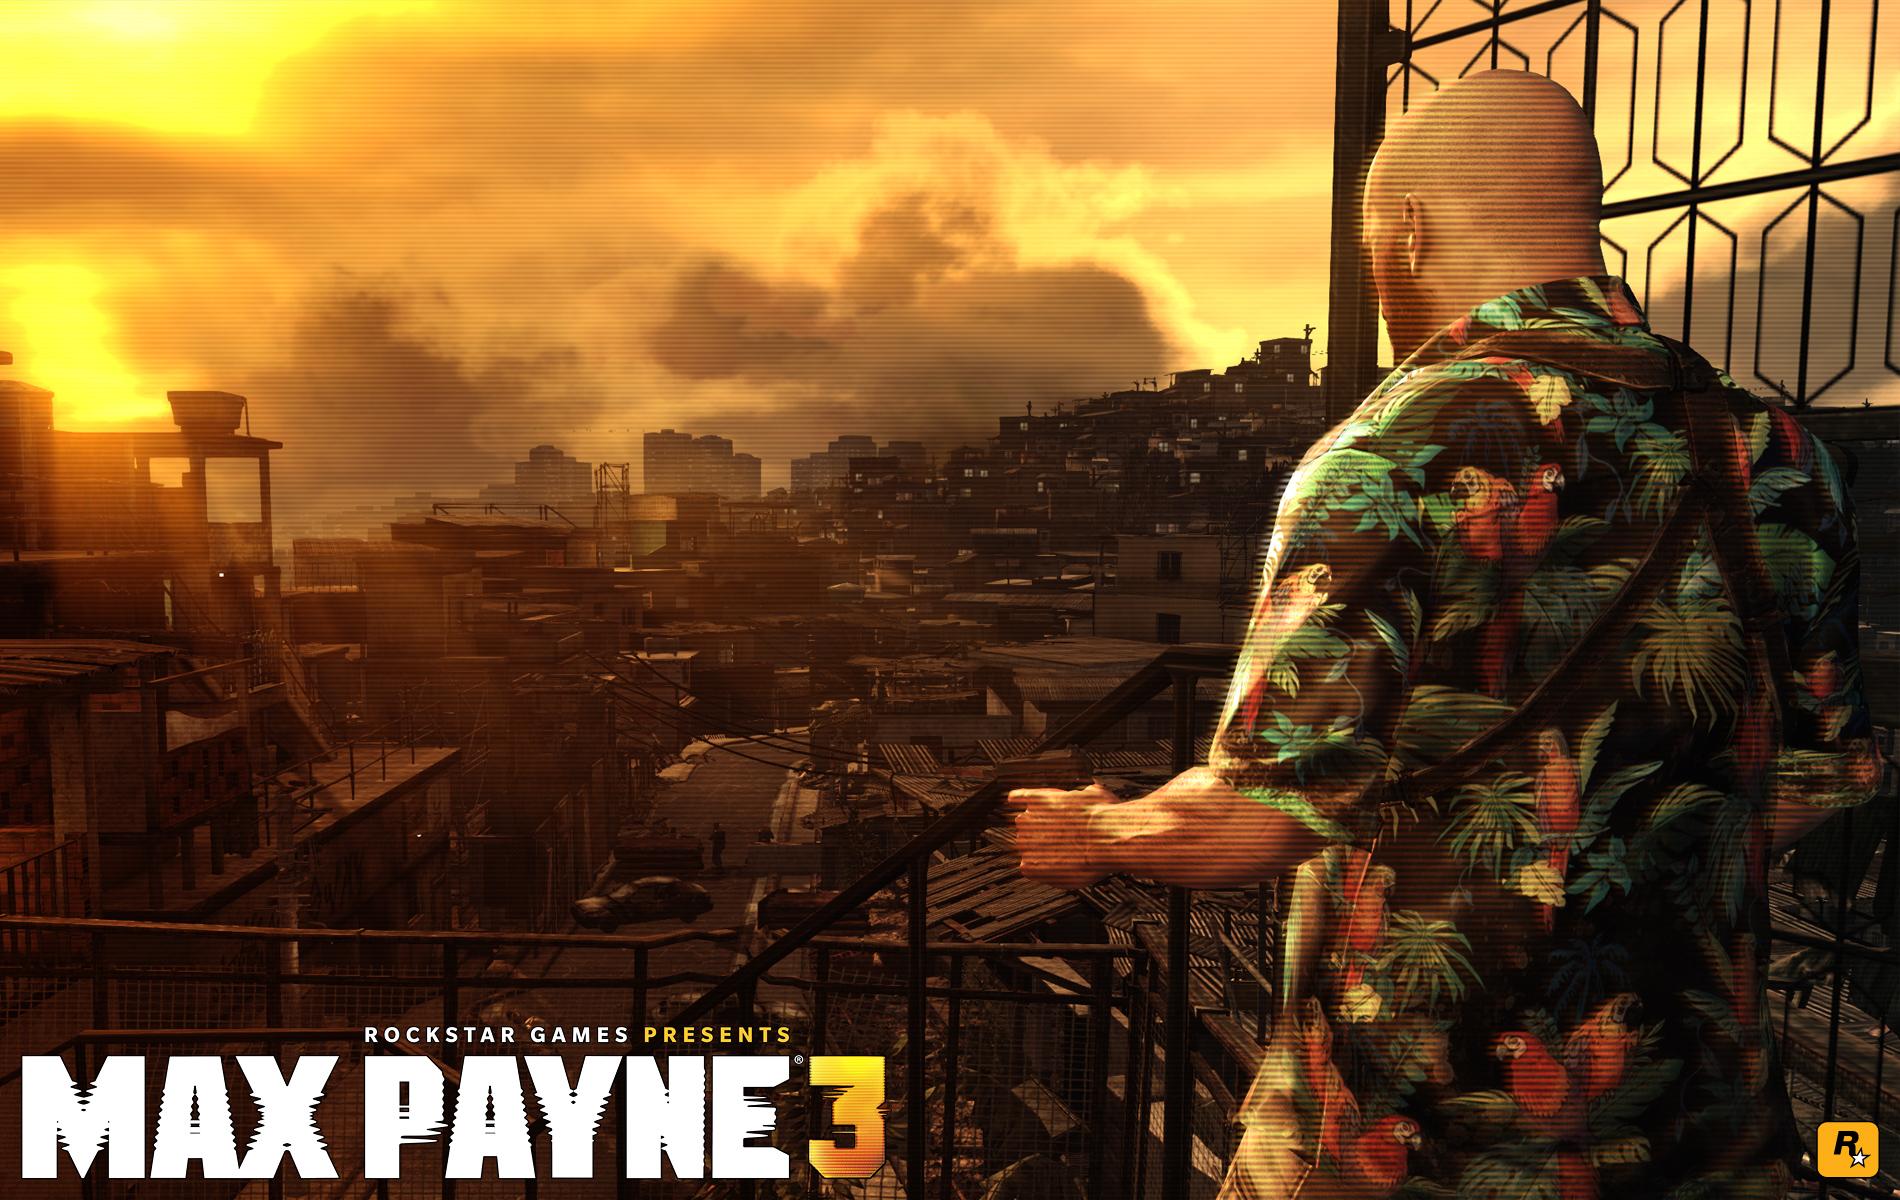 Free Download Max Payne 3 City Wallpaper Max Payne 3 Classic Max